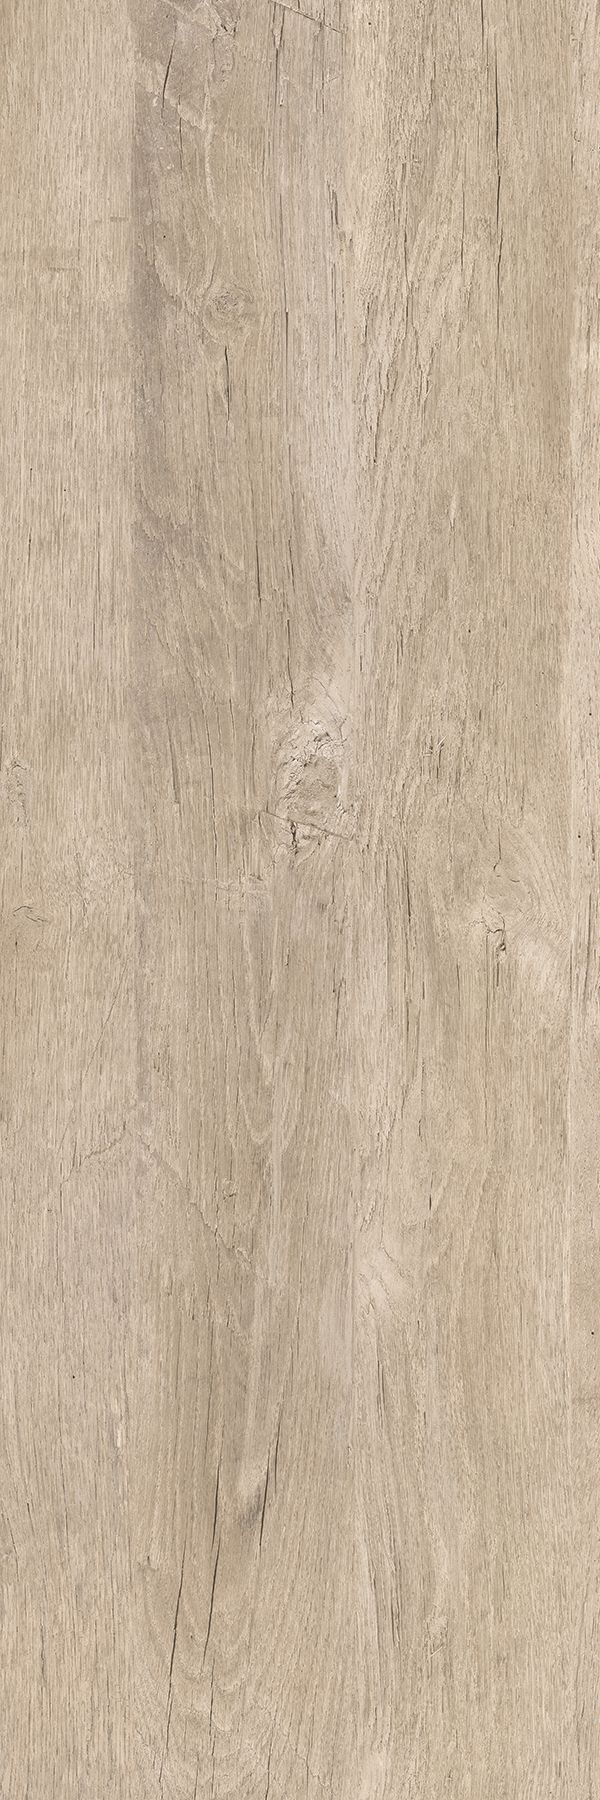 dalle monteverde del conca carrelage ext rieur 2 cm beige effet bois carra france. Black Bedroom Furniture Sets. Home Design Ideas